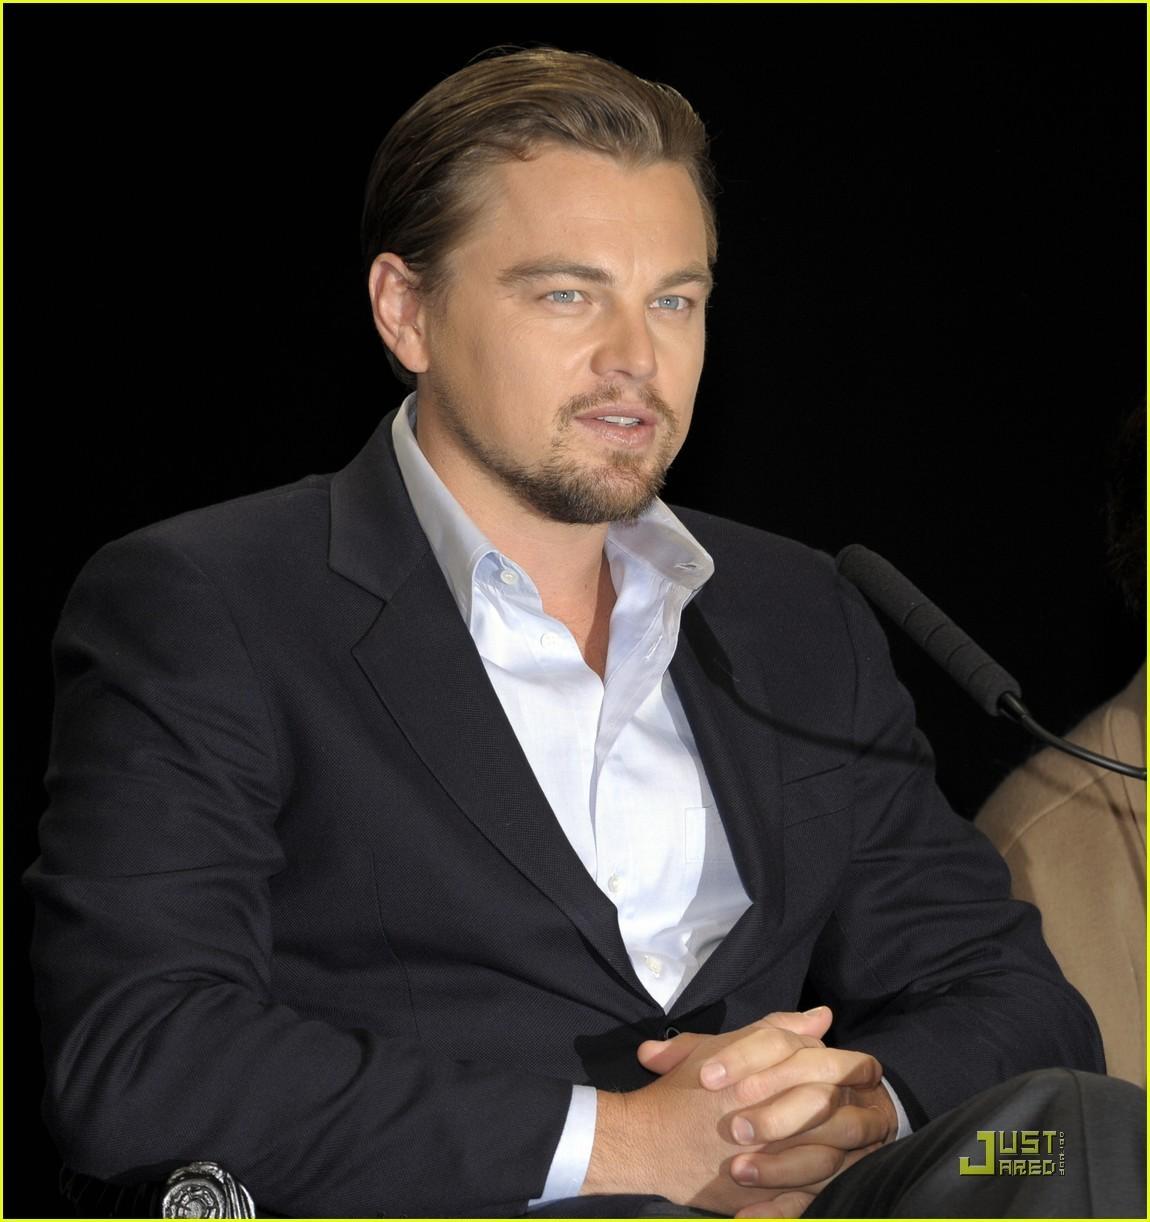 Leonardo DiCaprio - Photo Colection